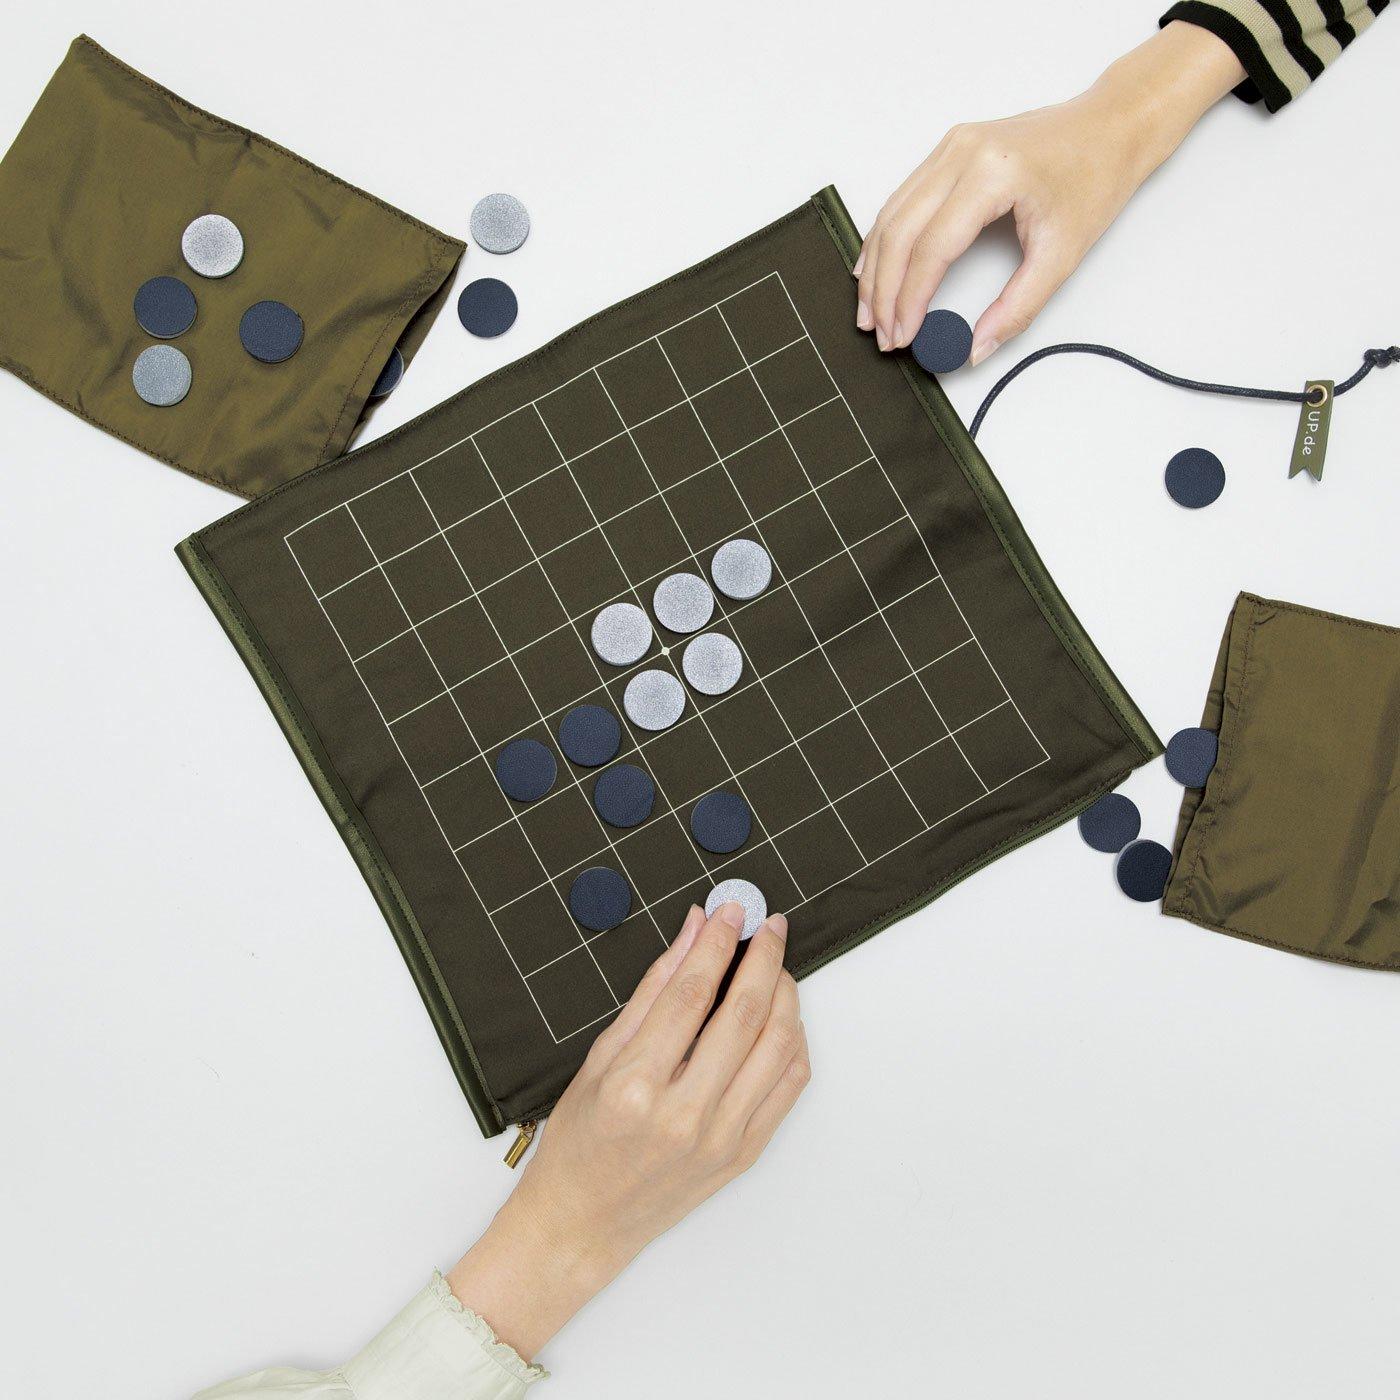 UP.de 楽しい時間を持ち運び リバーシゲームとしても使えるマルチポーチセット